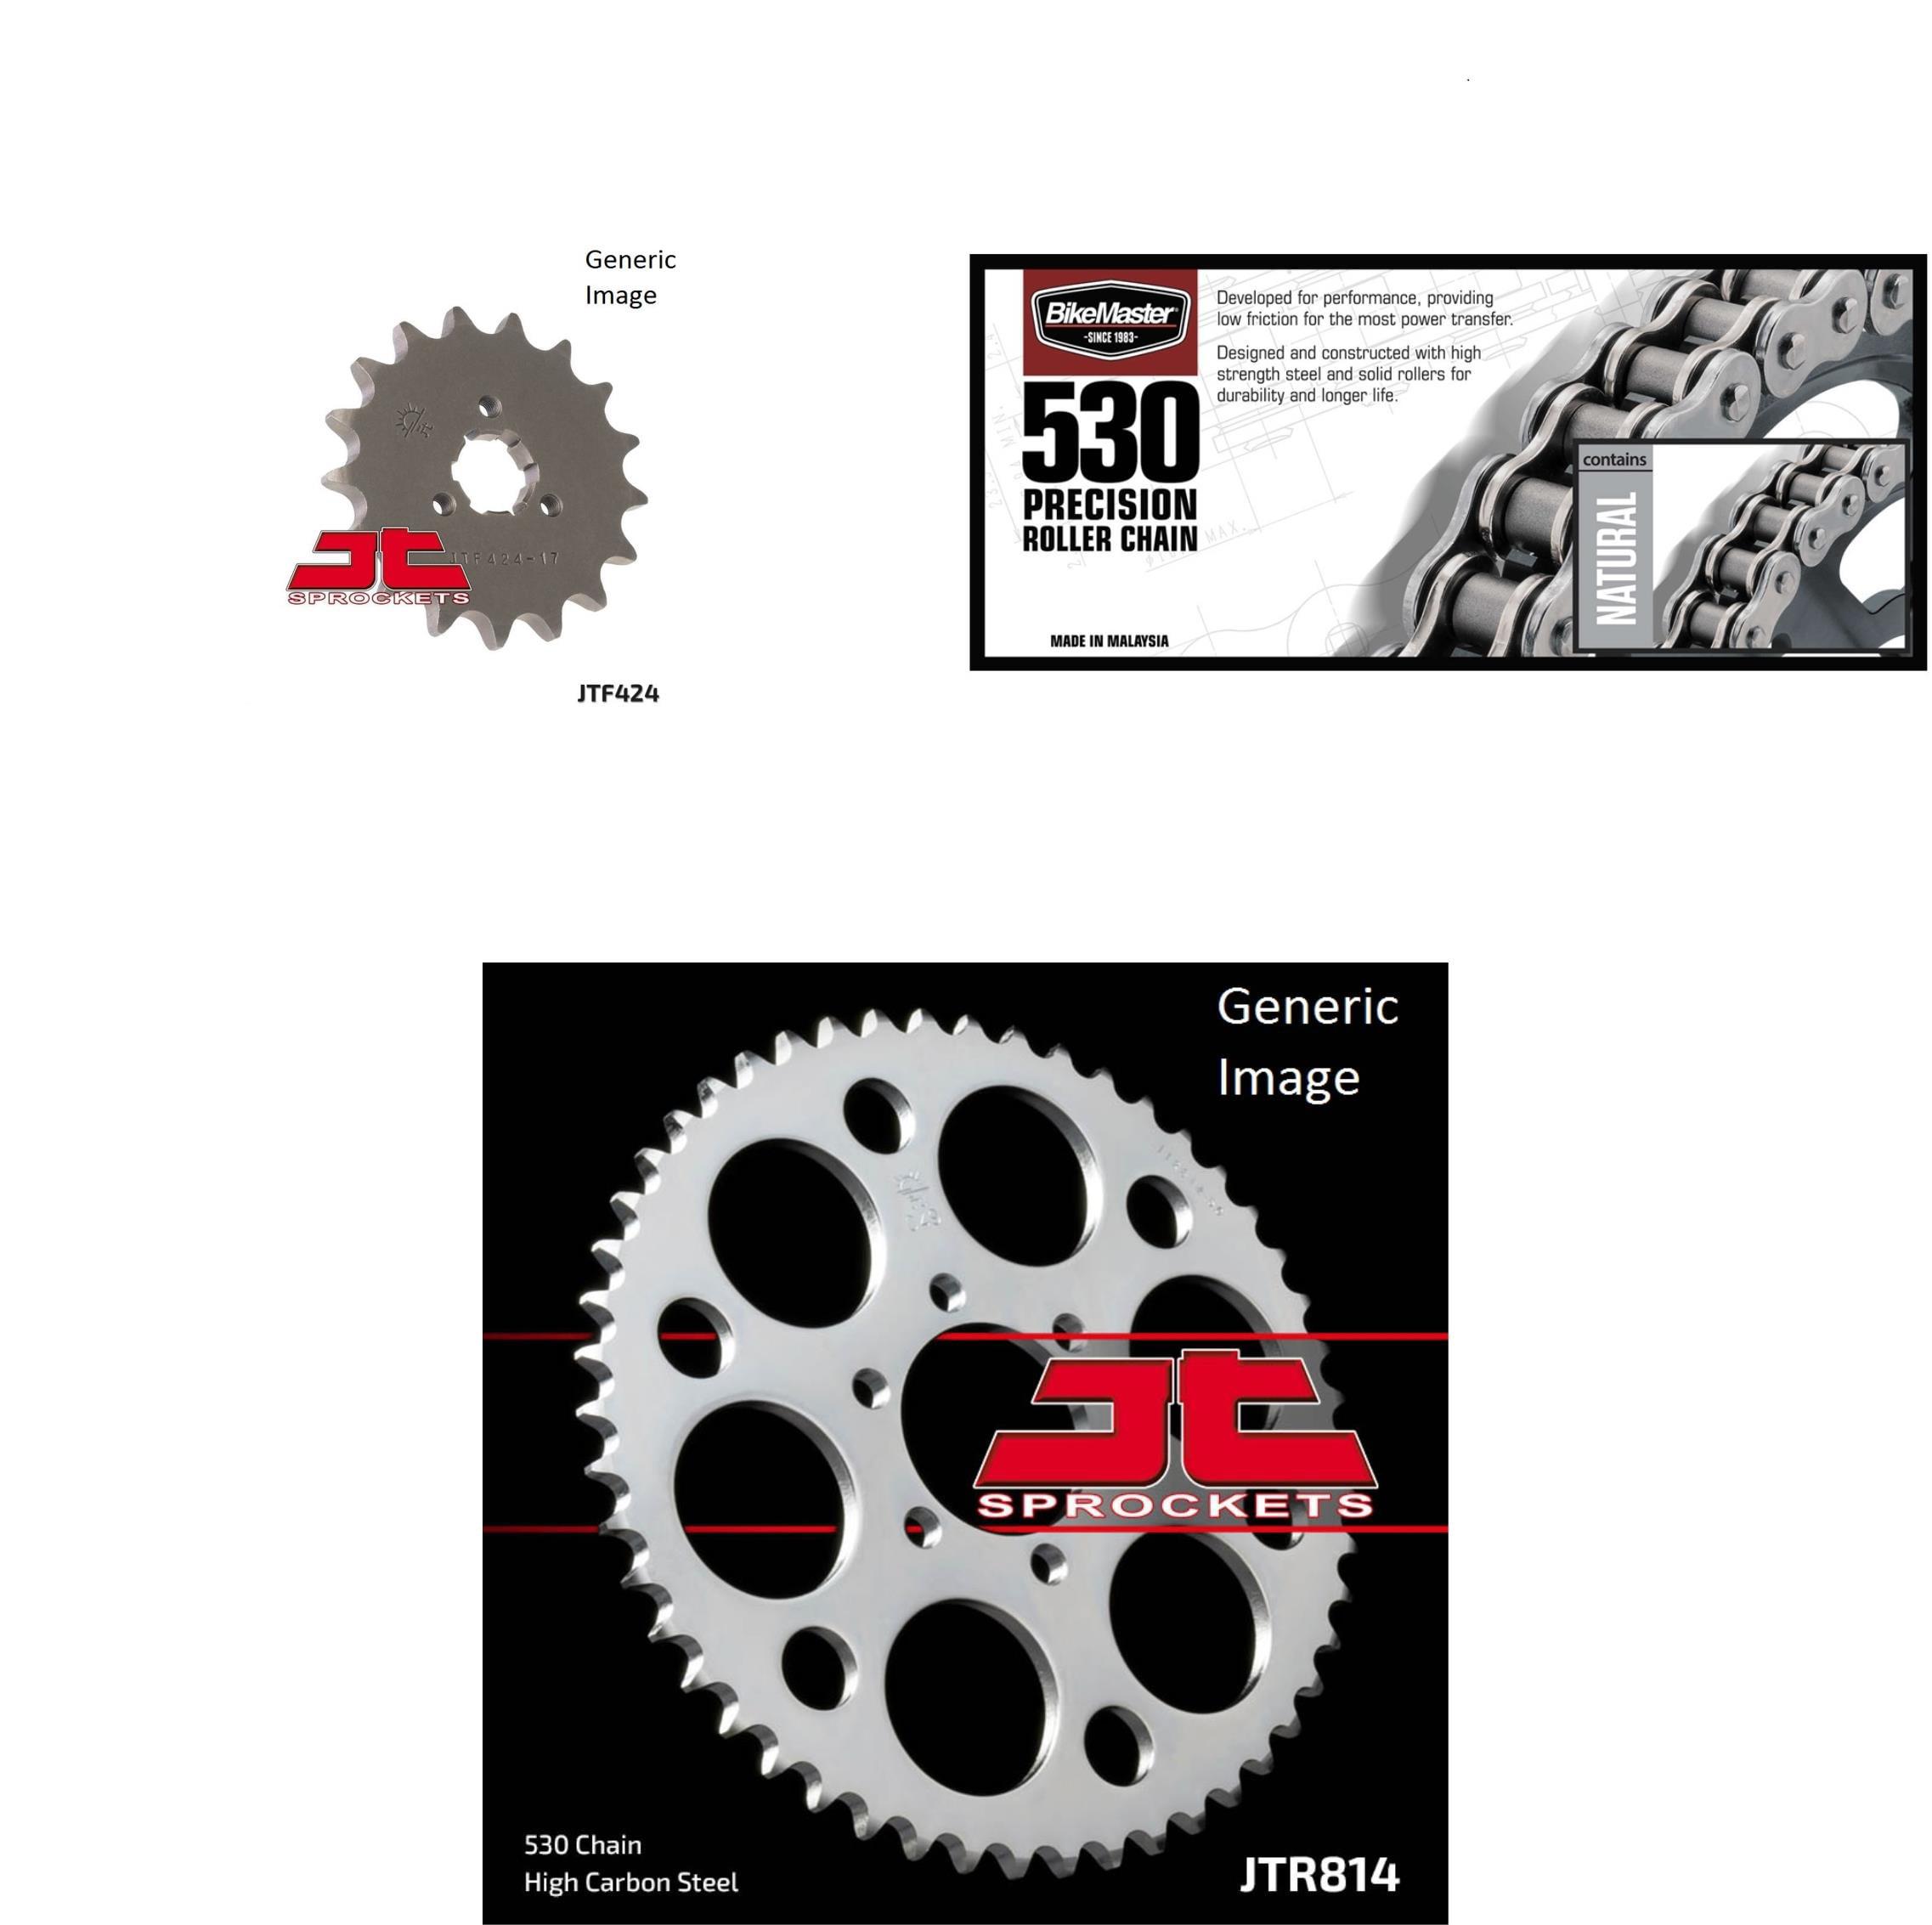 BIKEMASTER 530 Precision Roller Chain Natural, JT Front &...